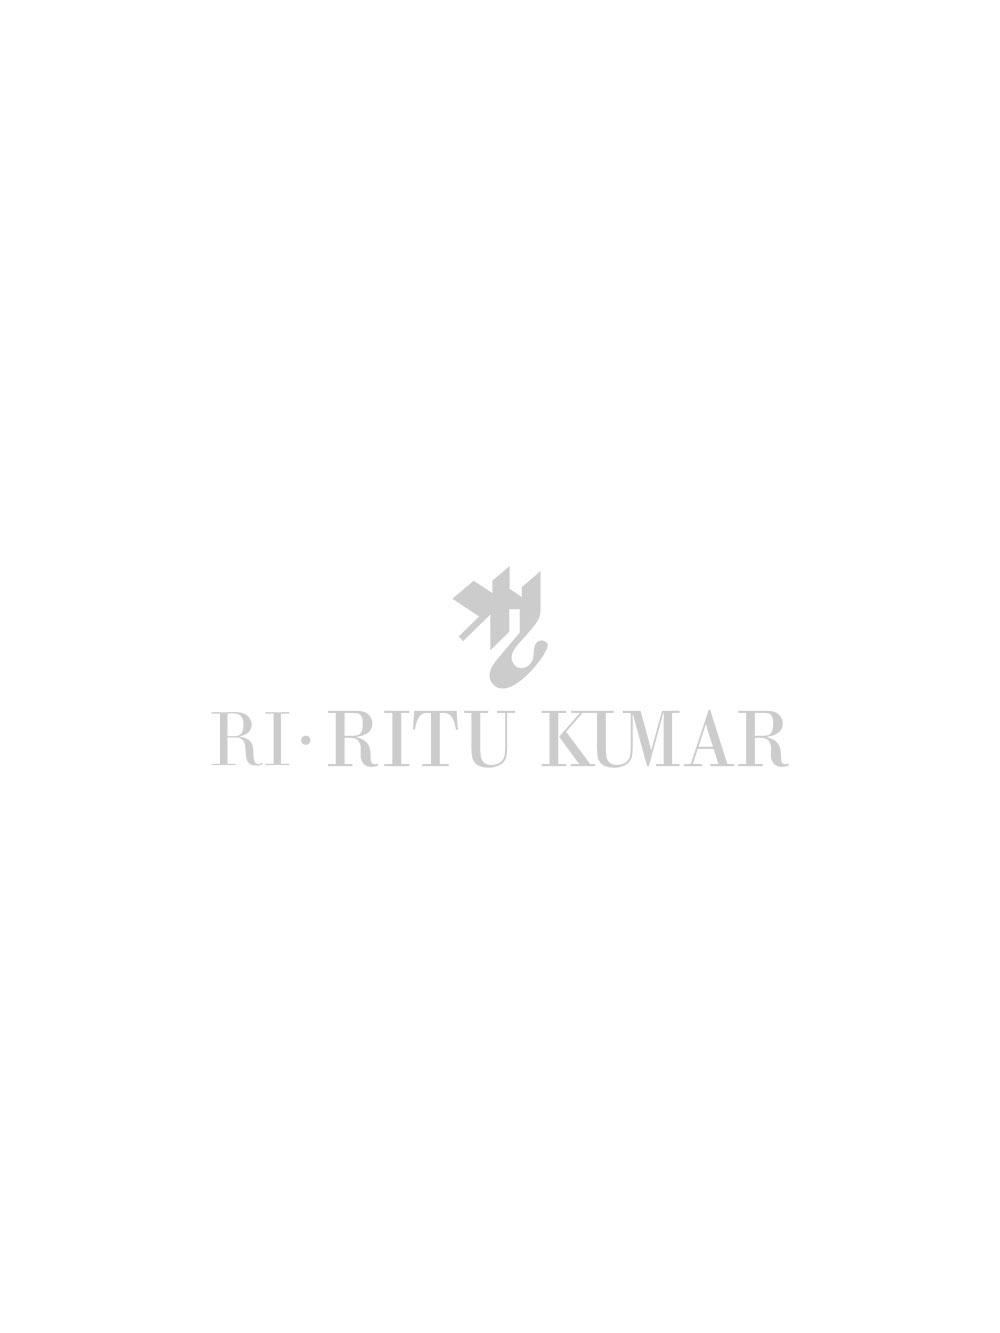 Aquamarine & Royal Blue Embroidered Kurta With Dupatta And Trousers